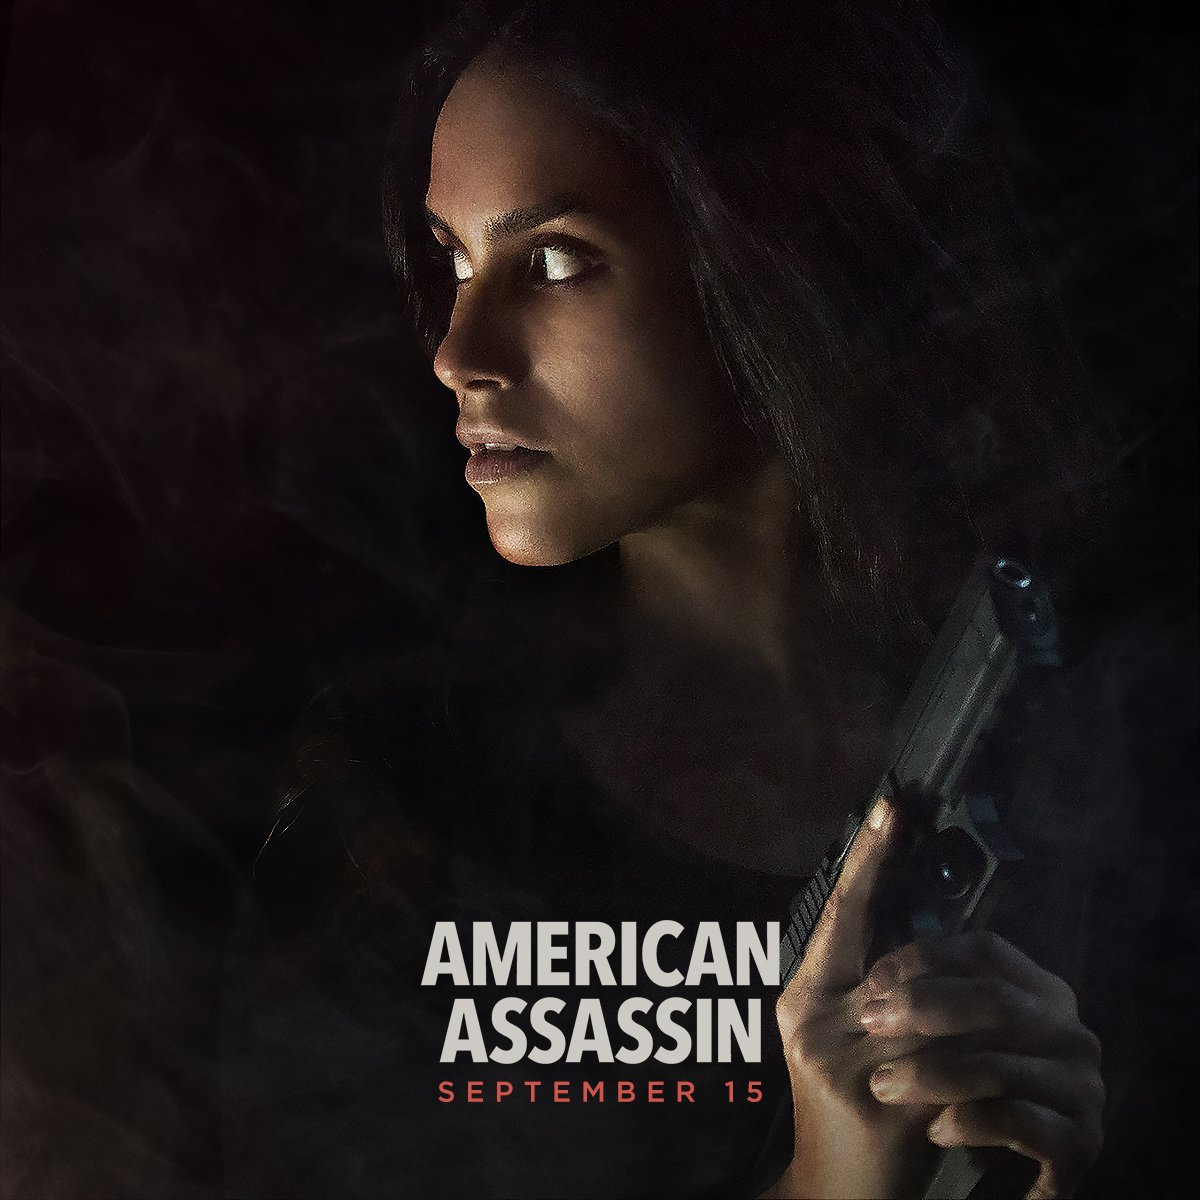 Resultado de imagem para american assassin 2017